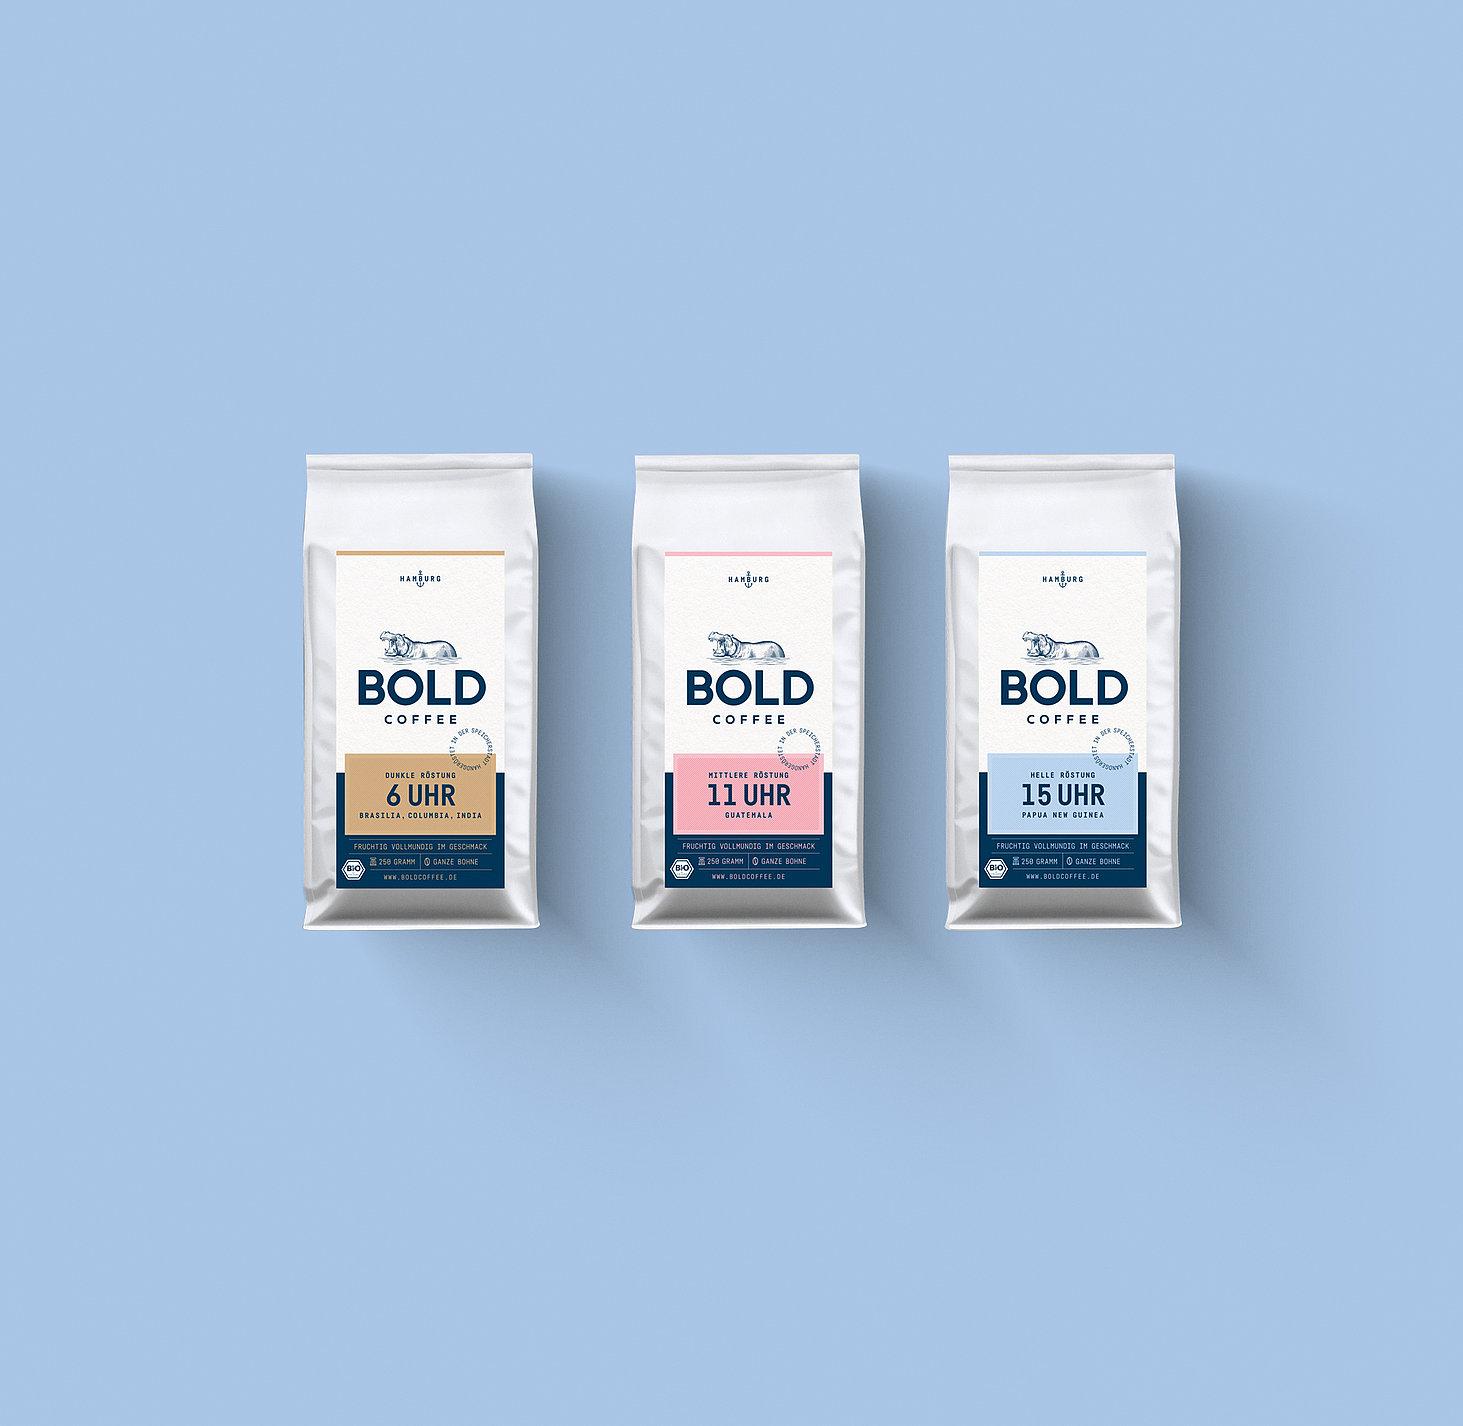 BOLD COFFEE | Red Dot Design Award